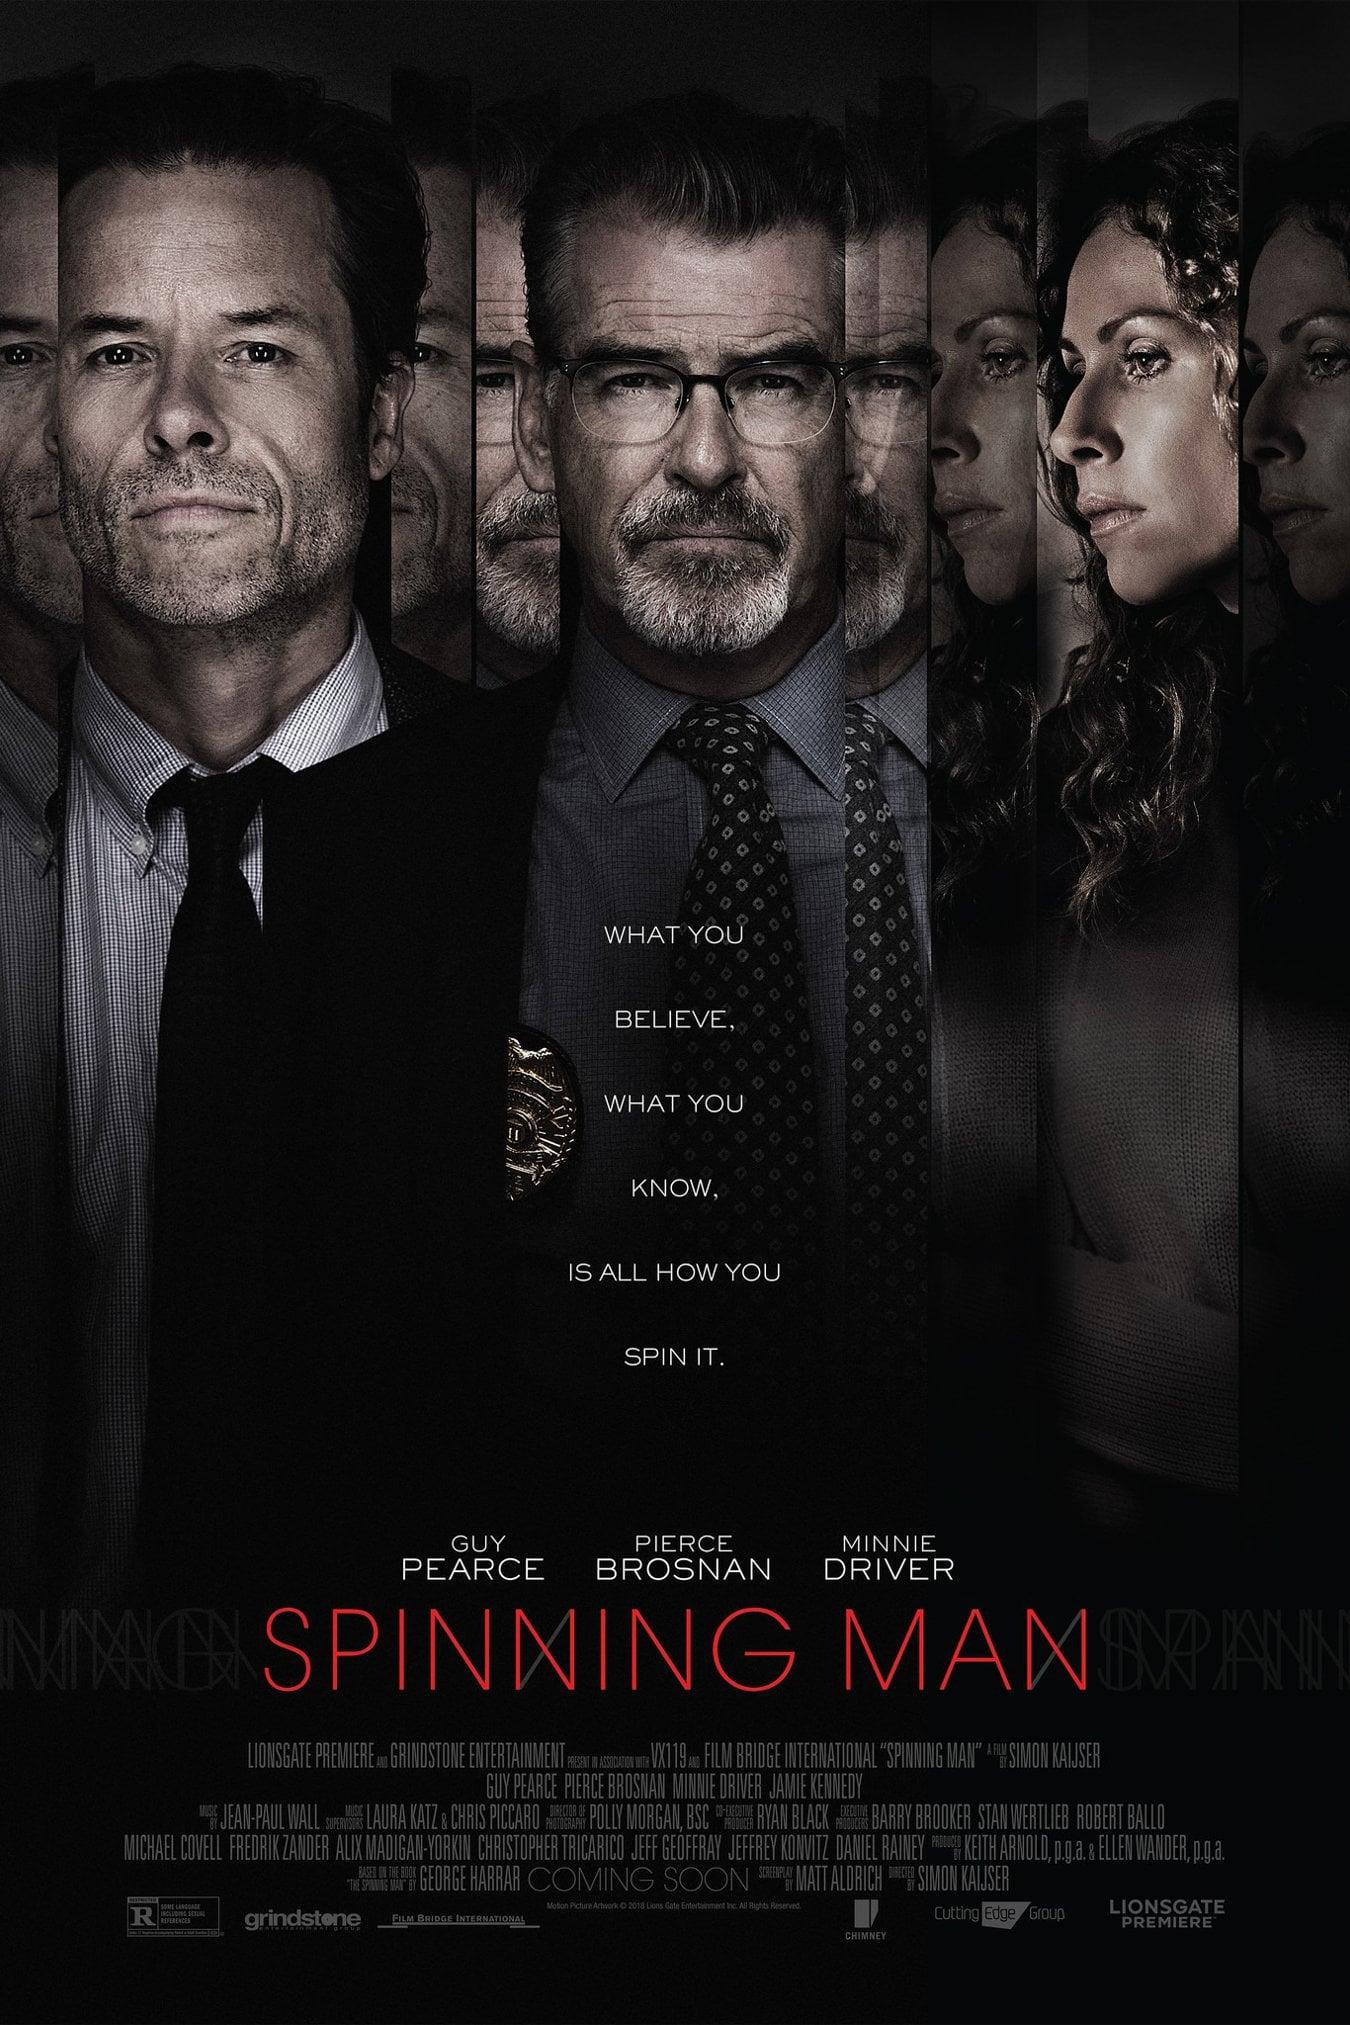 Spinning Man 2018 720p BluRay x264-x0r